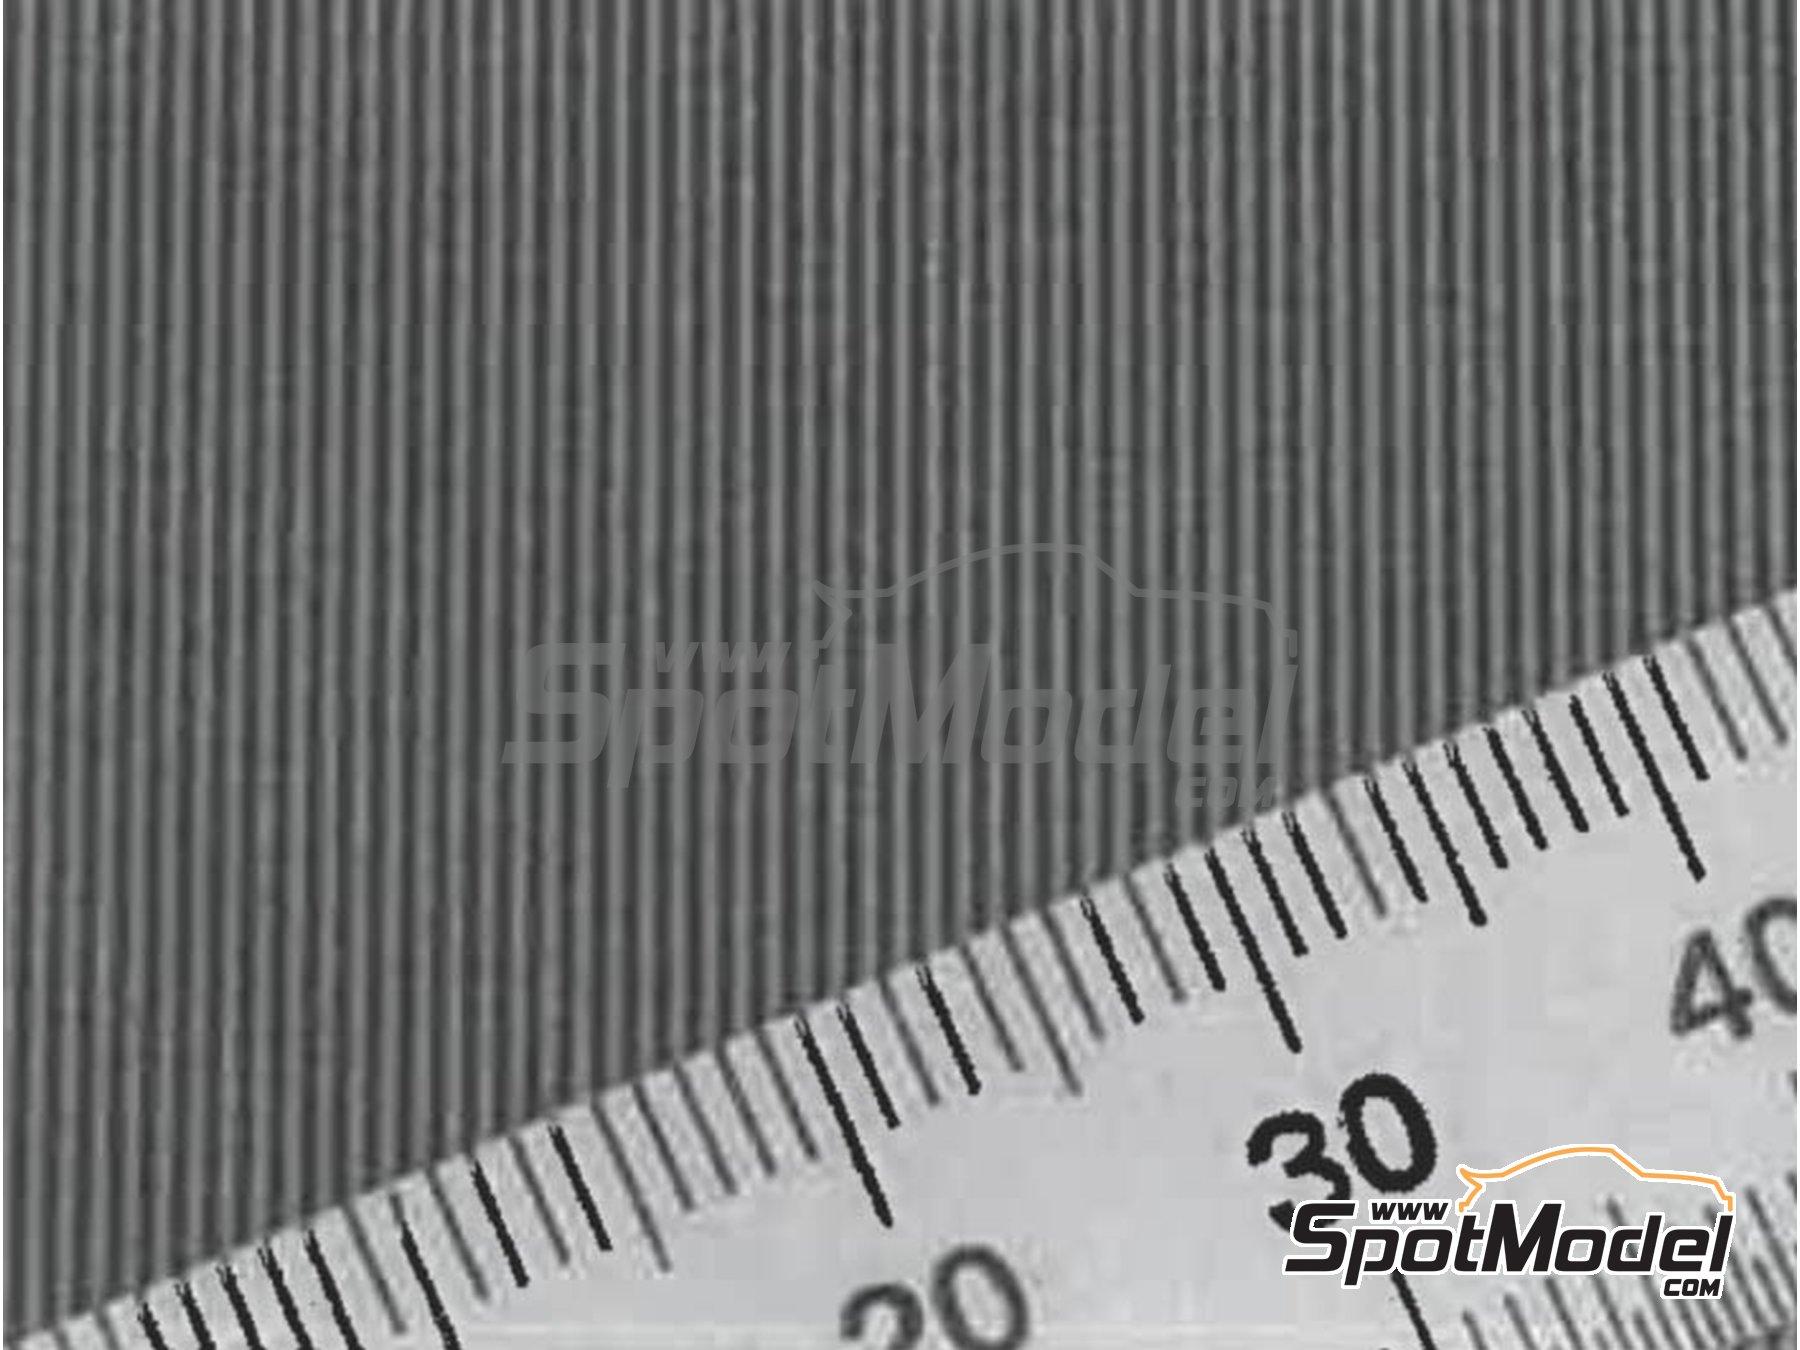 Image 1: Fibra de carbono con trama gruesa de tipo 1 de tamaño pequeño | Calcas de agua fabricado por Model Factory Hiro (ref.MFH-P1138)